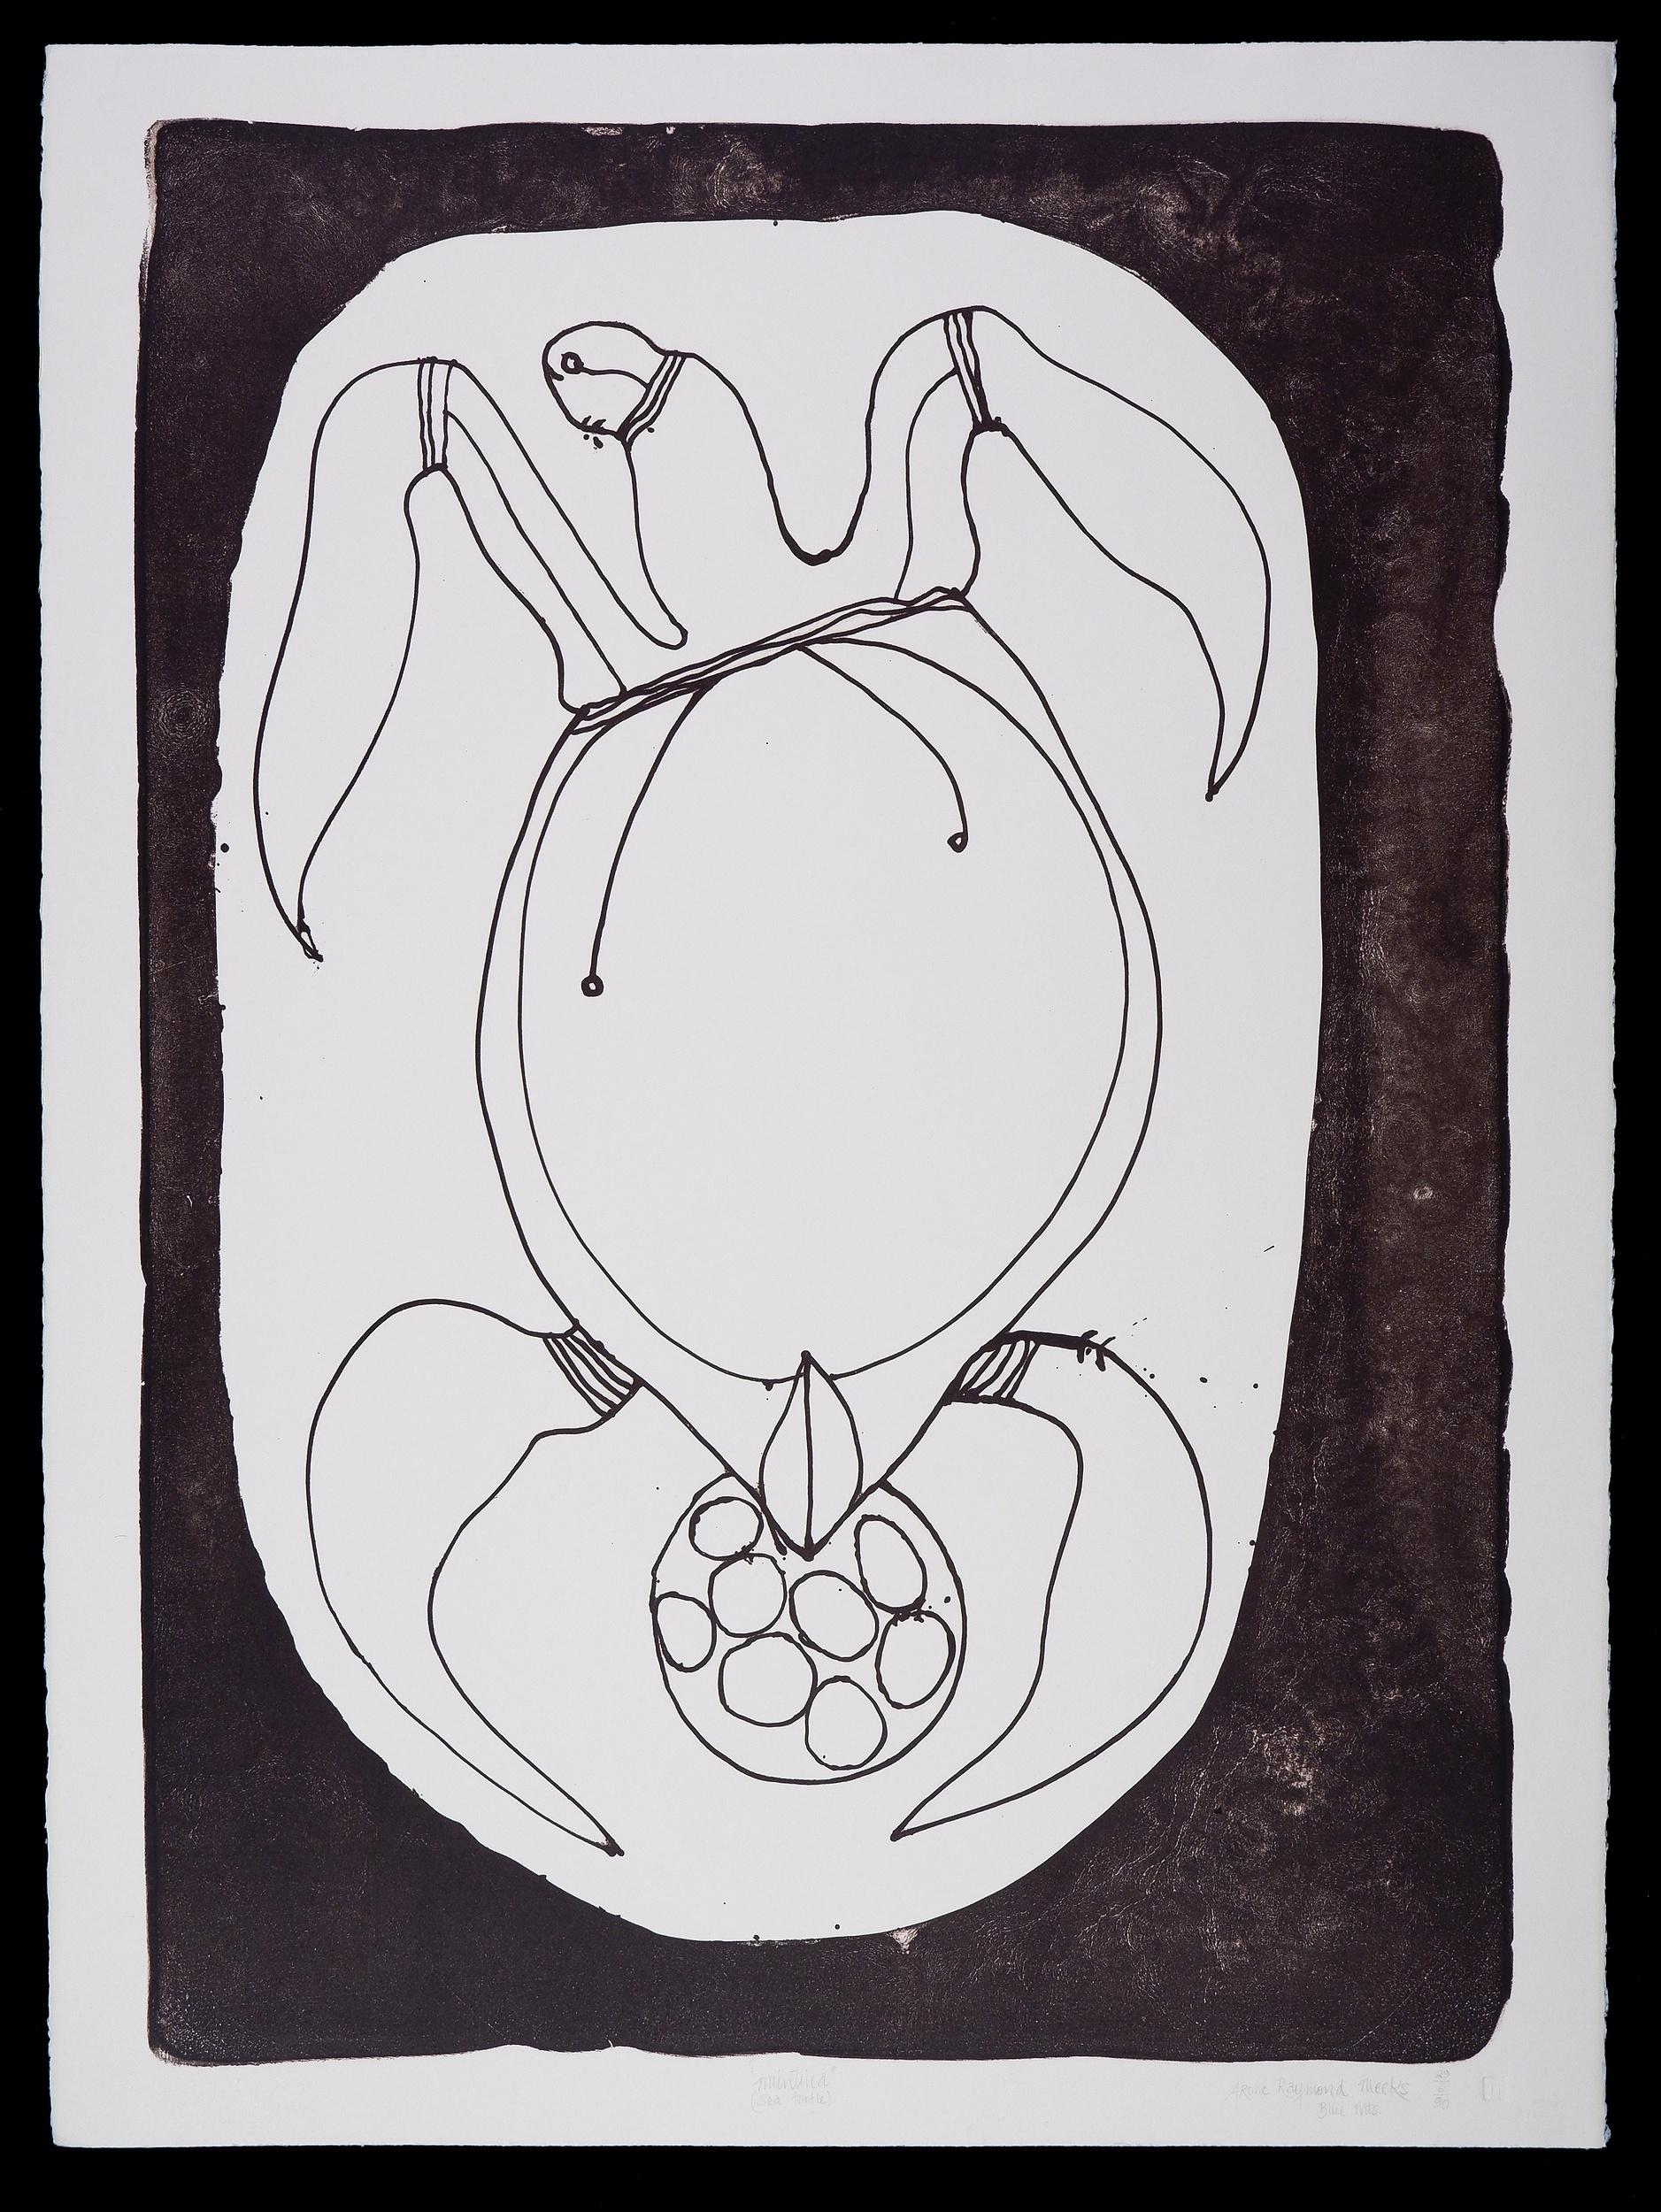 'Arone Raymond Meeks (born 1957, Kukumidjii/Kukulanadiji language group), Muntina (Sea Turtle) 1990, Lithograph, Edition of 30, 70 x 50 cm (image size)'